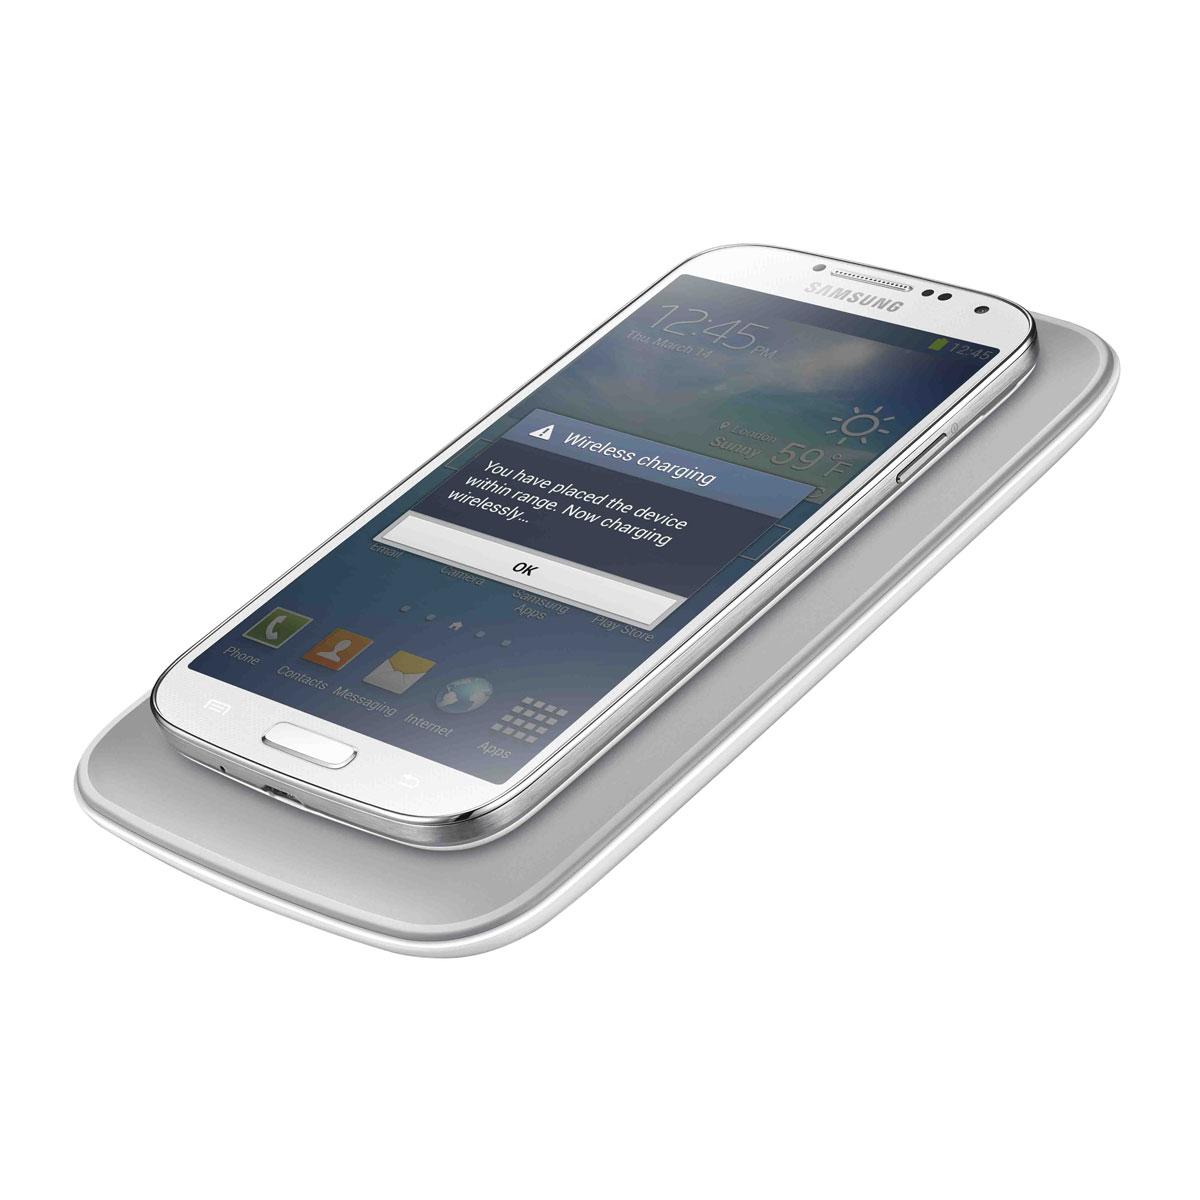 samsung tapis de recharge induction ep wi950 blanc chargeur t l phone samsung sur ldlc. Black Bedroom Furniture Sets. Home Design Ideas